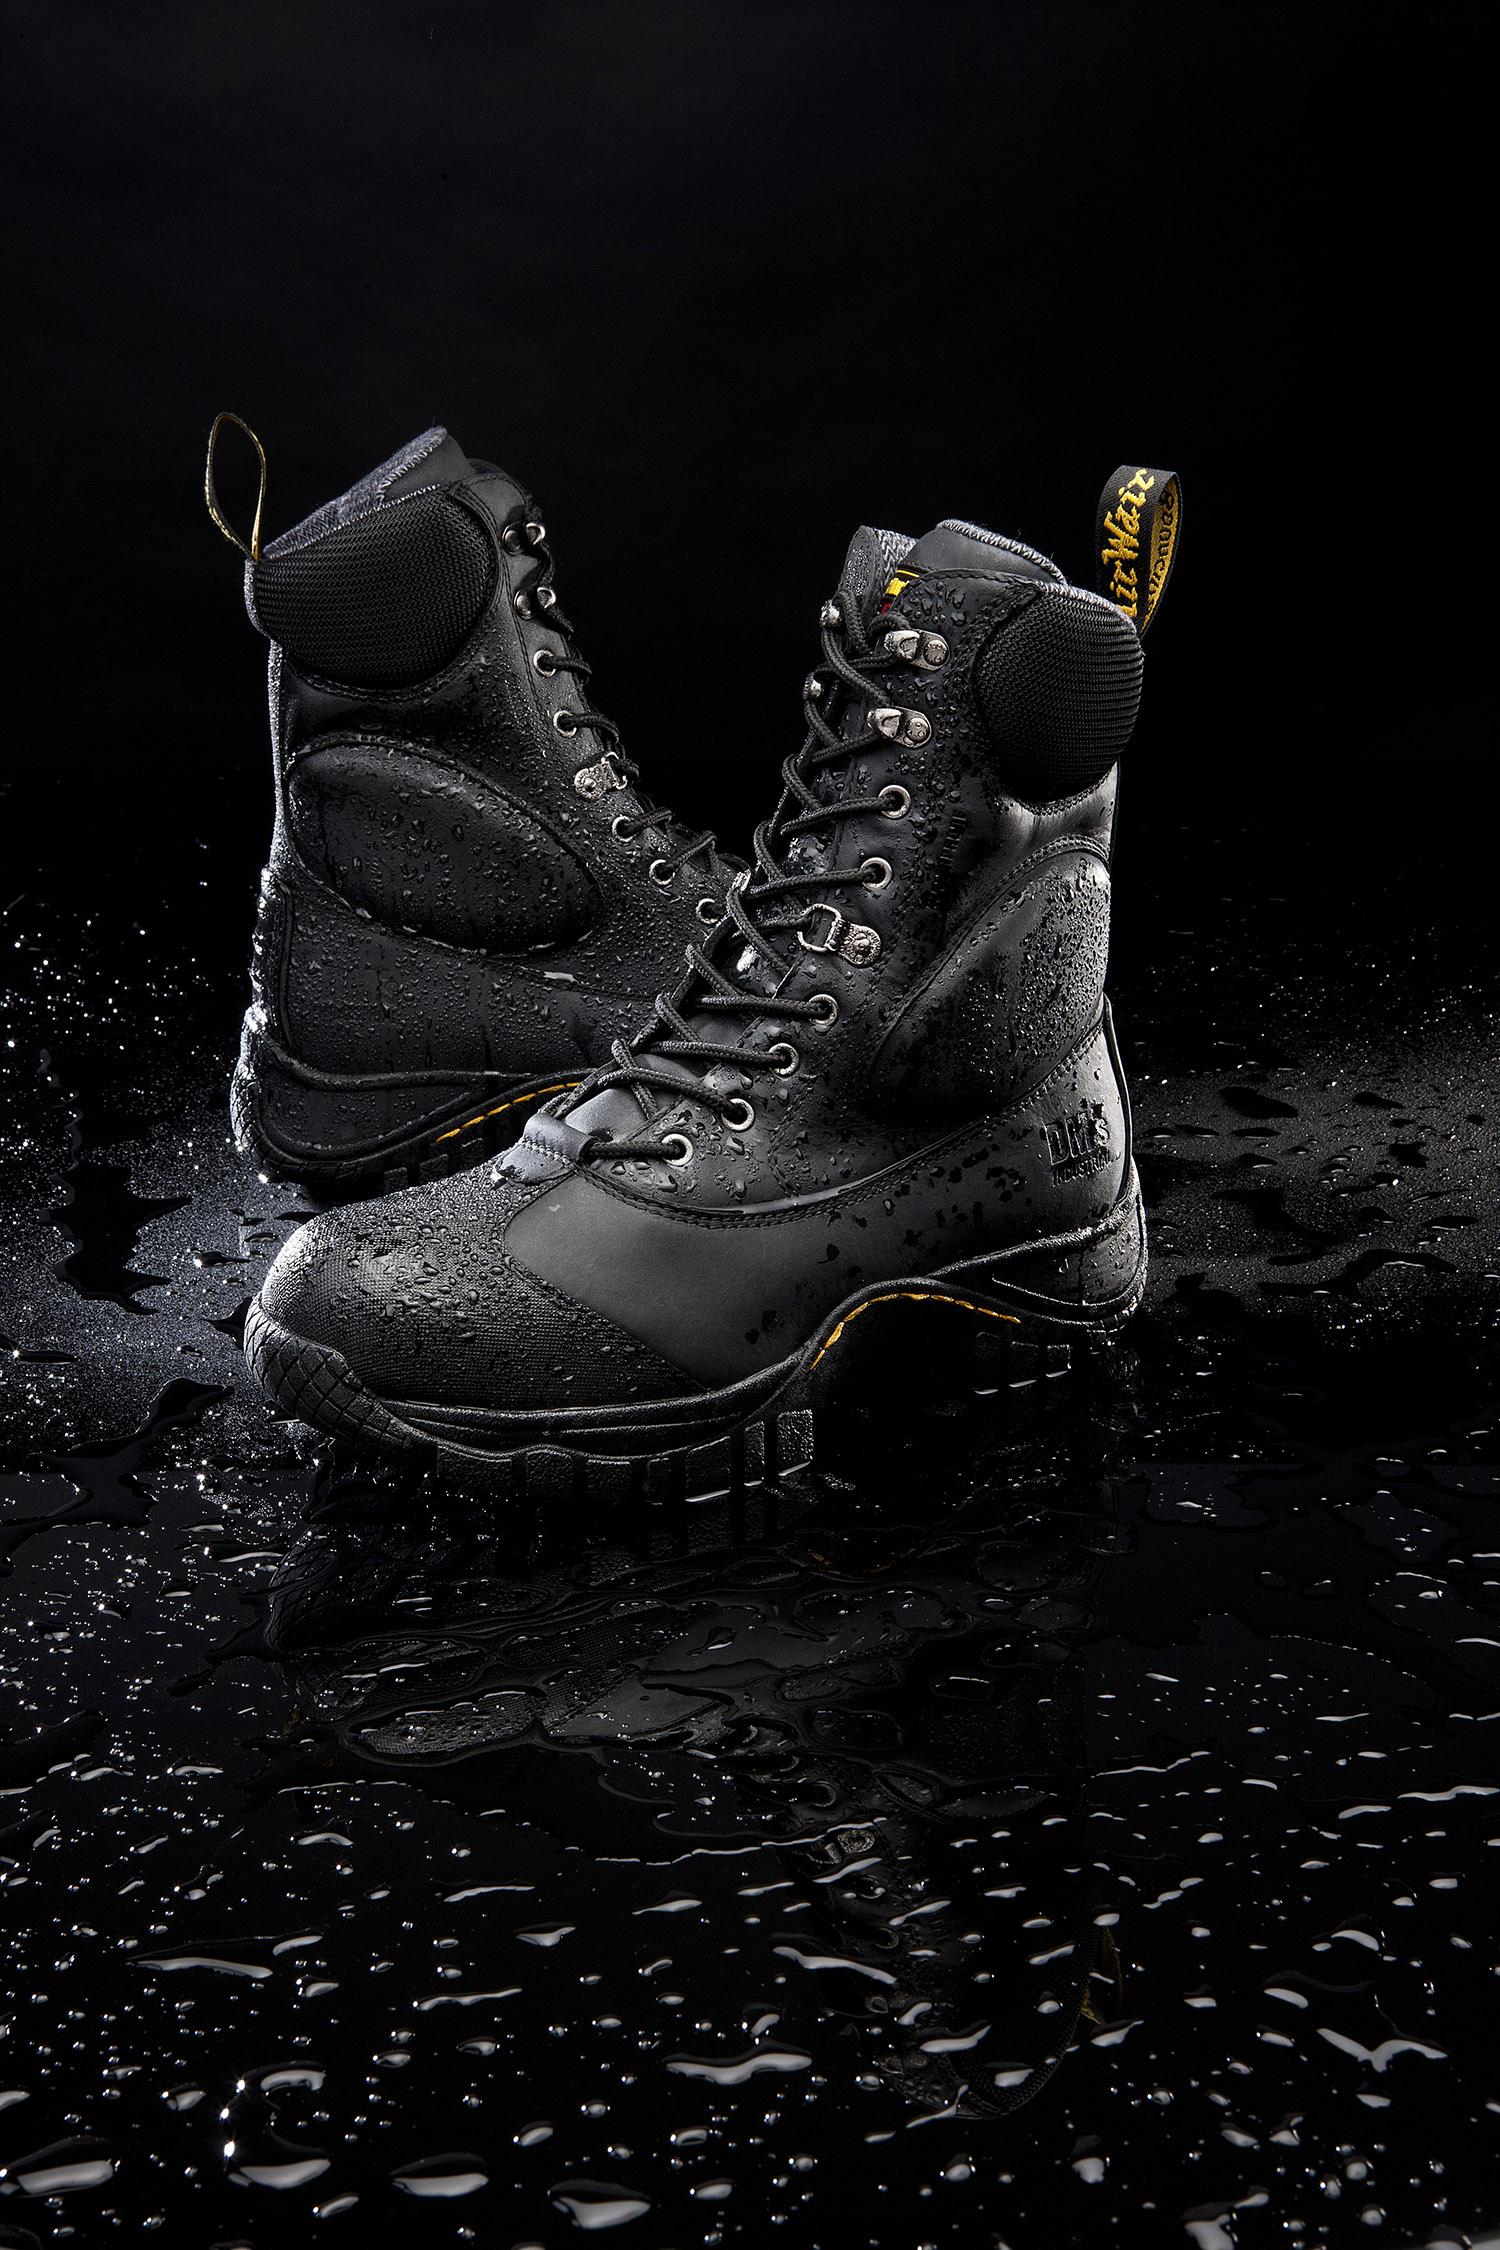 Shoes_021LR.jpg